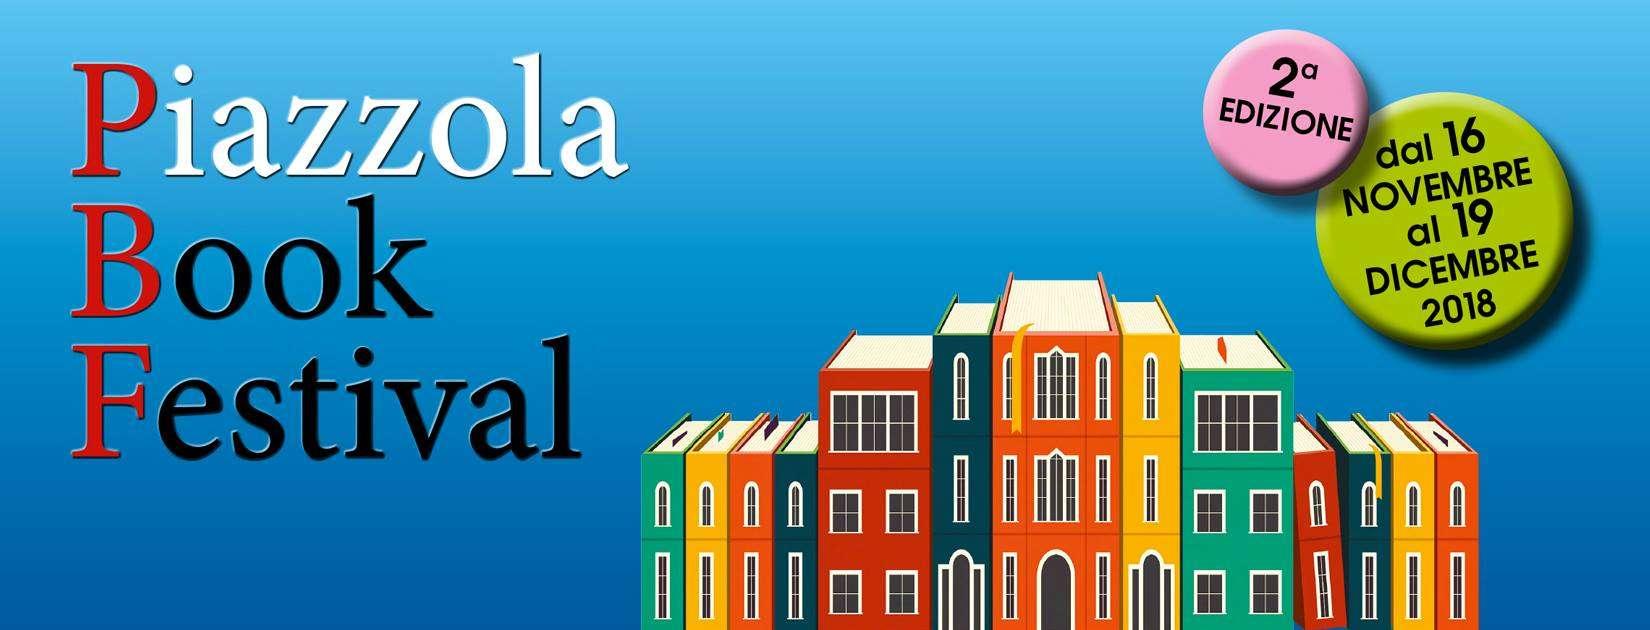 Piazzola Book Festival 2018